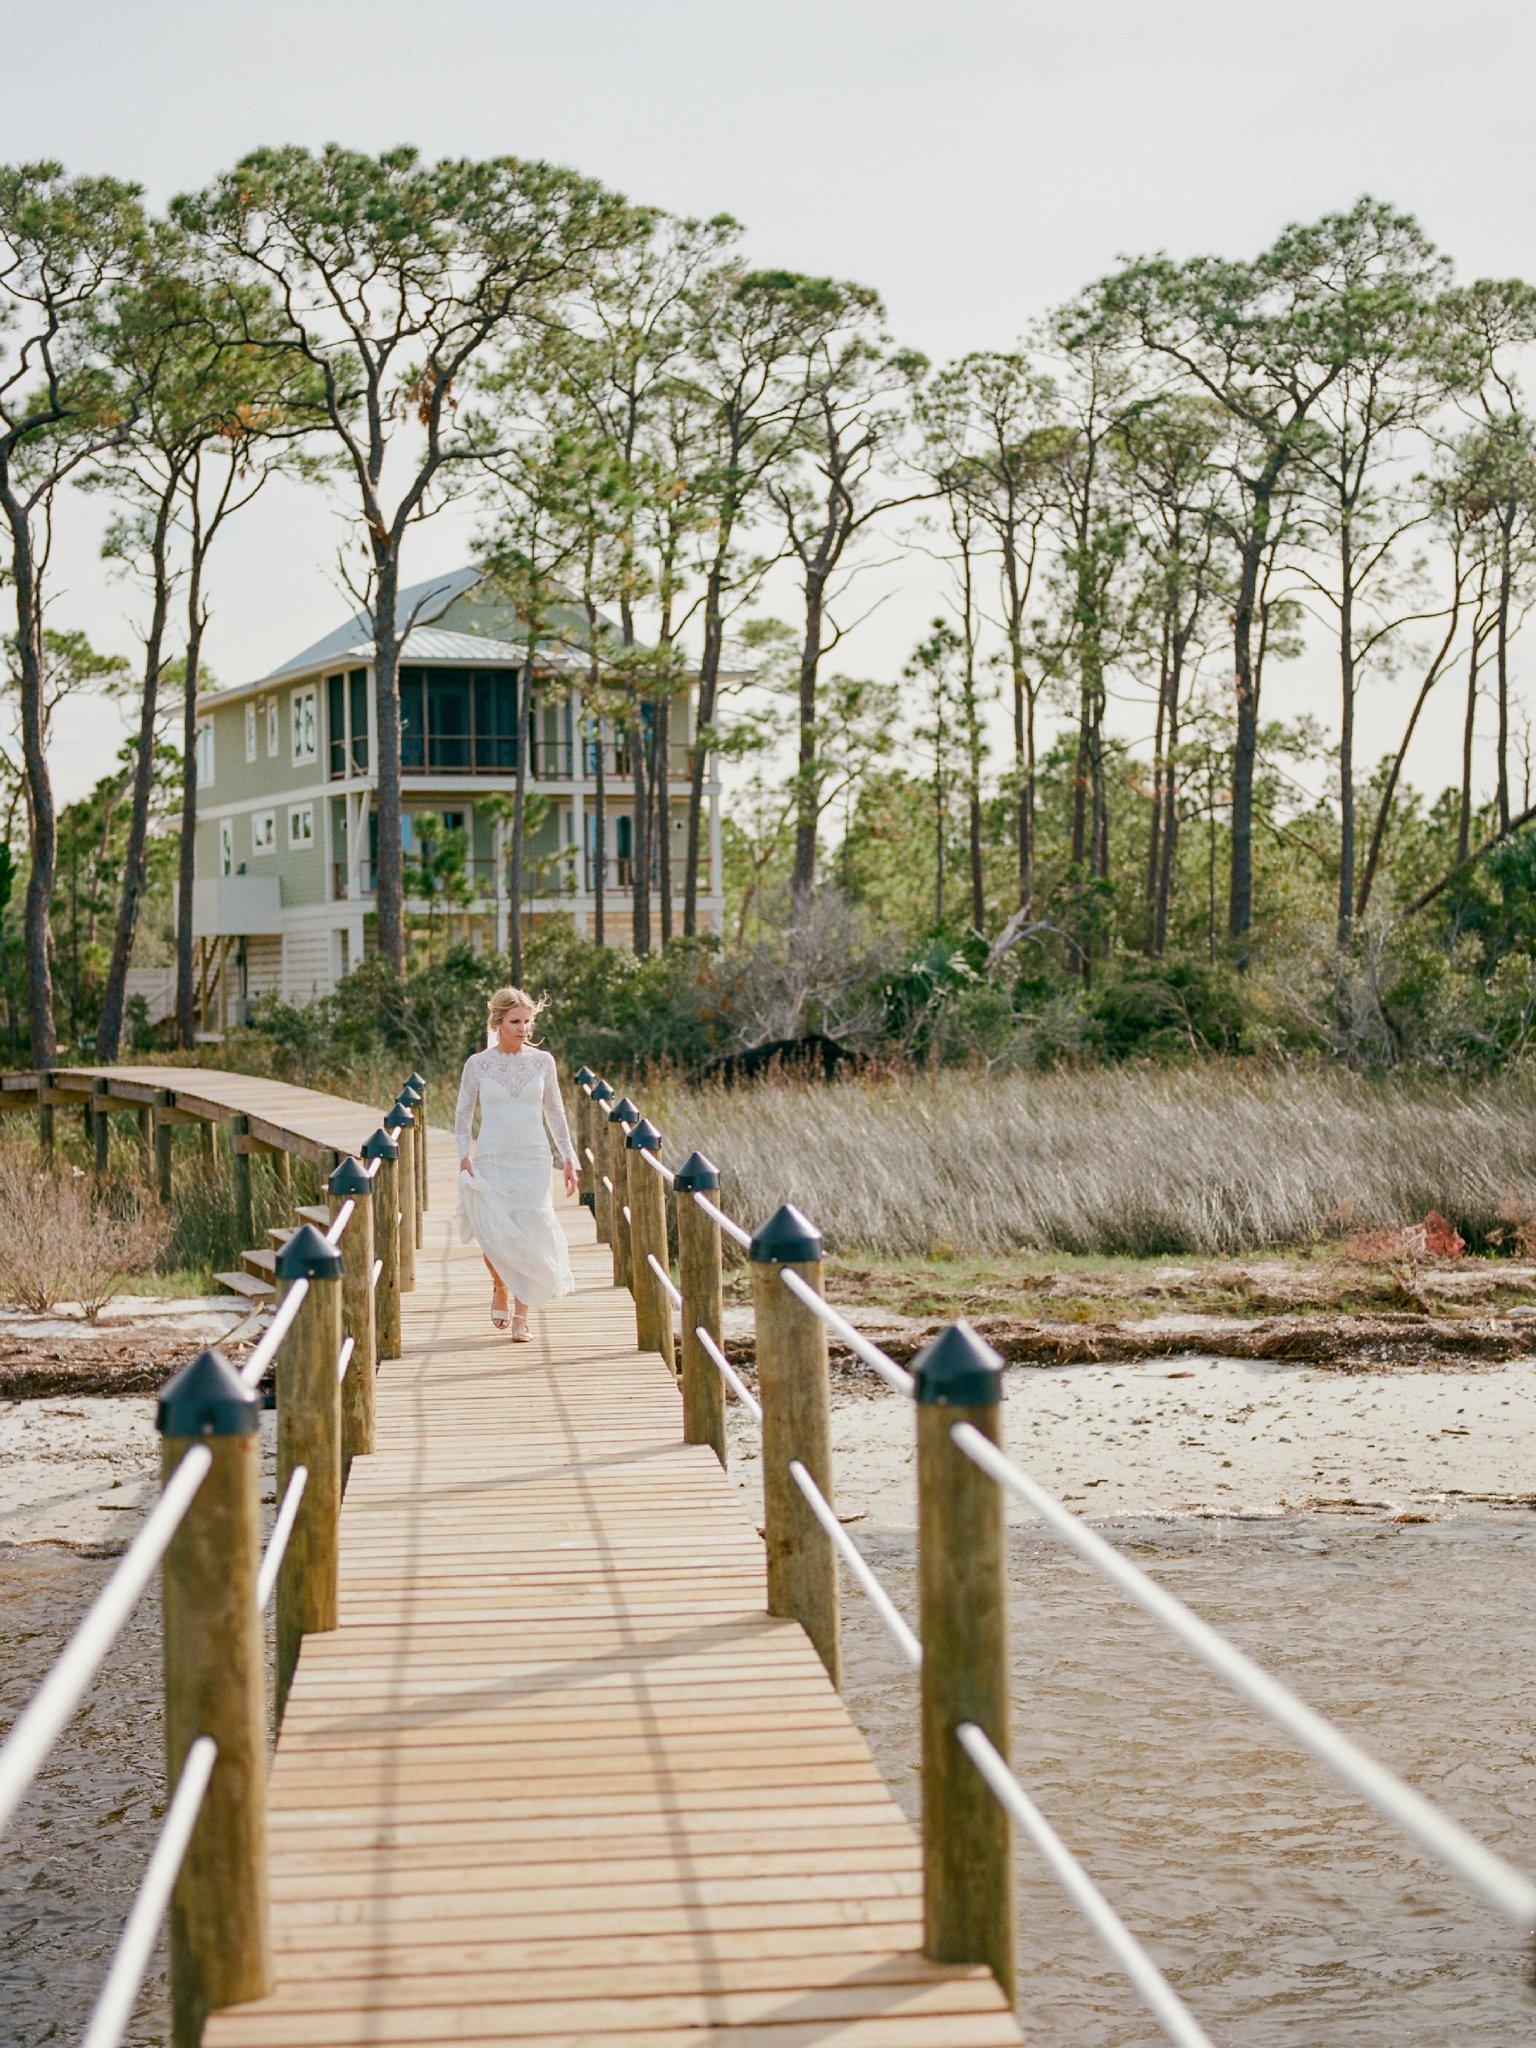 st+george+island+wedding+st+george+island+photographer+shannon+griffin+photography_0060.jpg